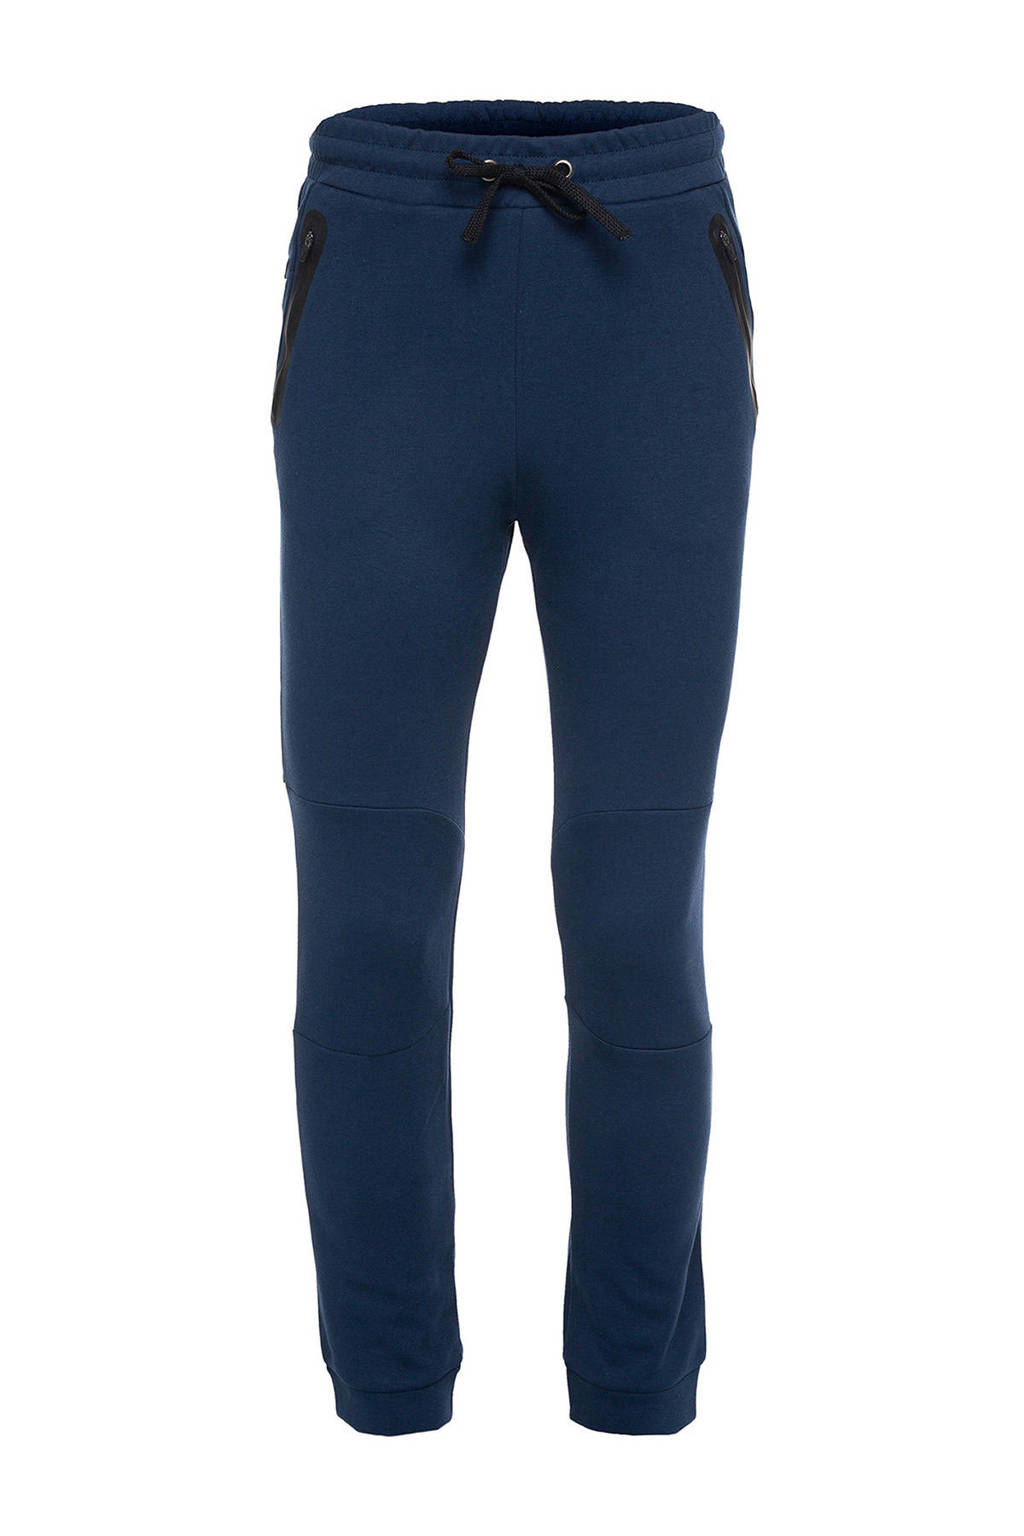 Scapino Osaga joggingbroek donkerblauw, Donkerblauw